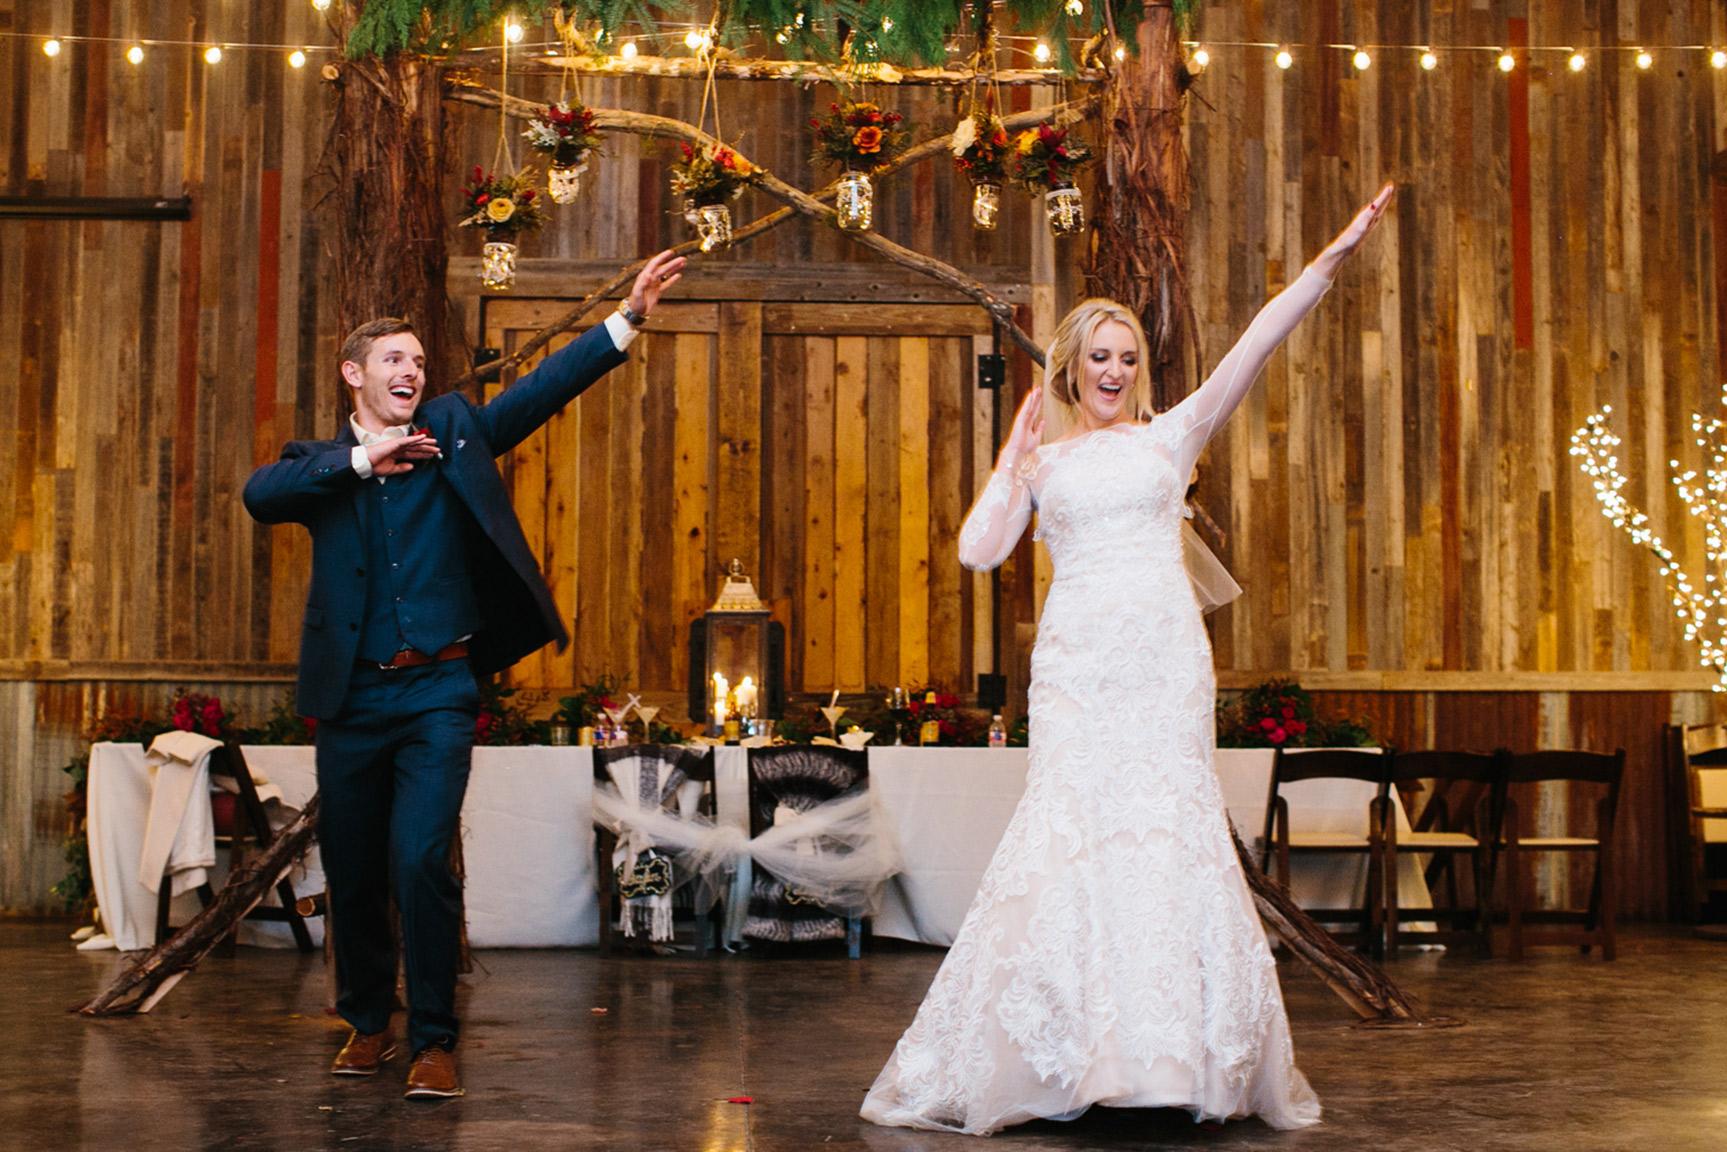 Cotton_Creek_Barn_Winter_Wedding_WeddingPhotographer055.jpg